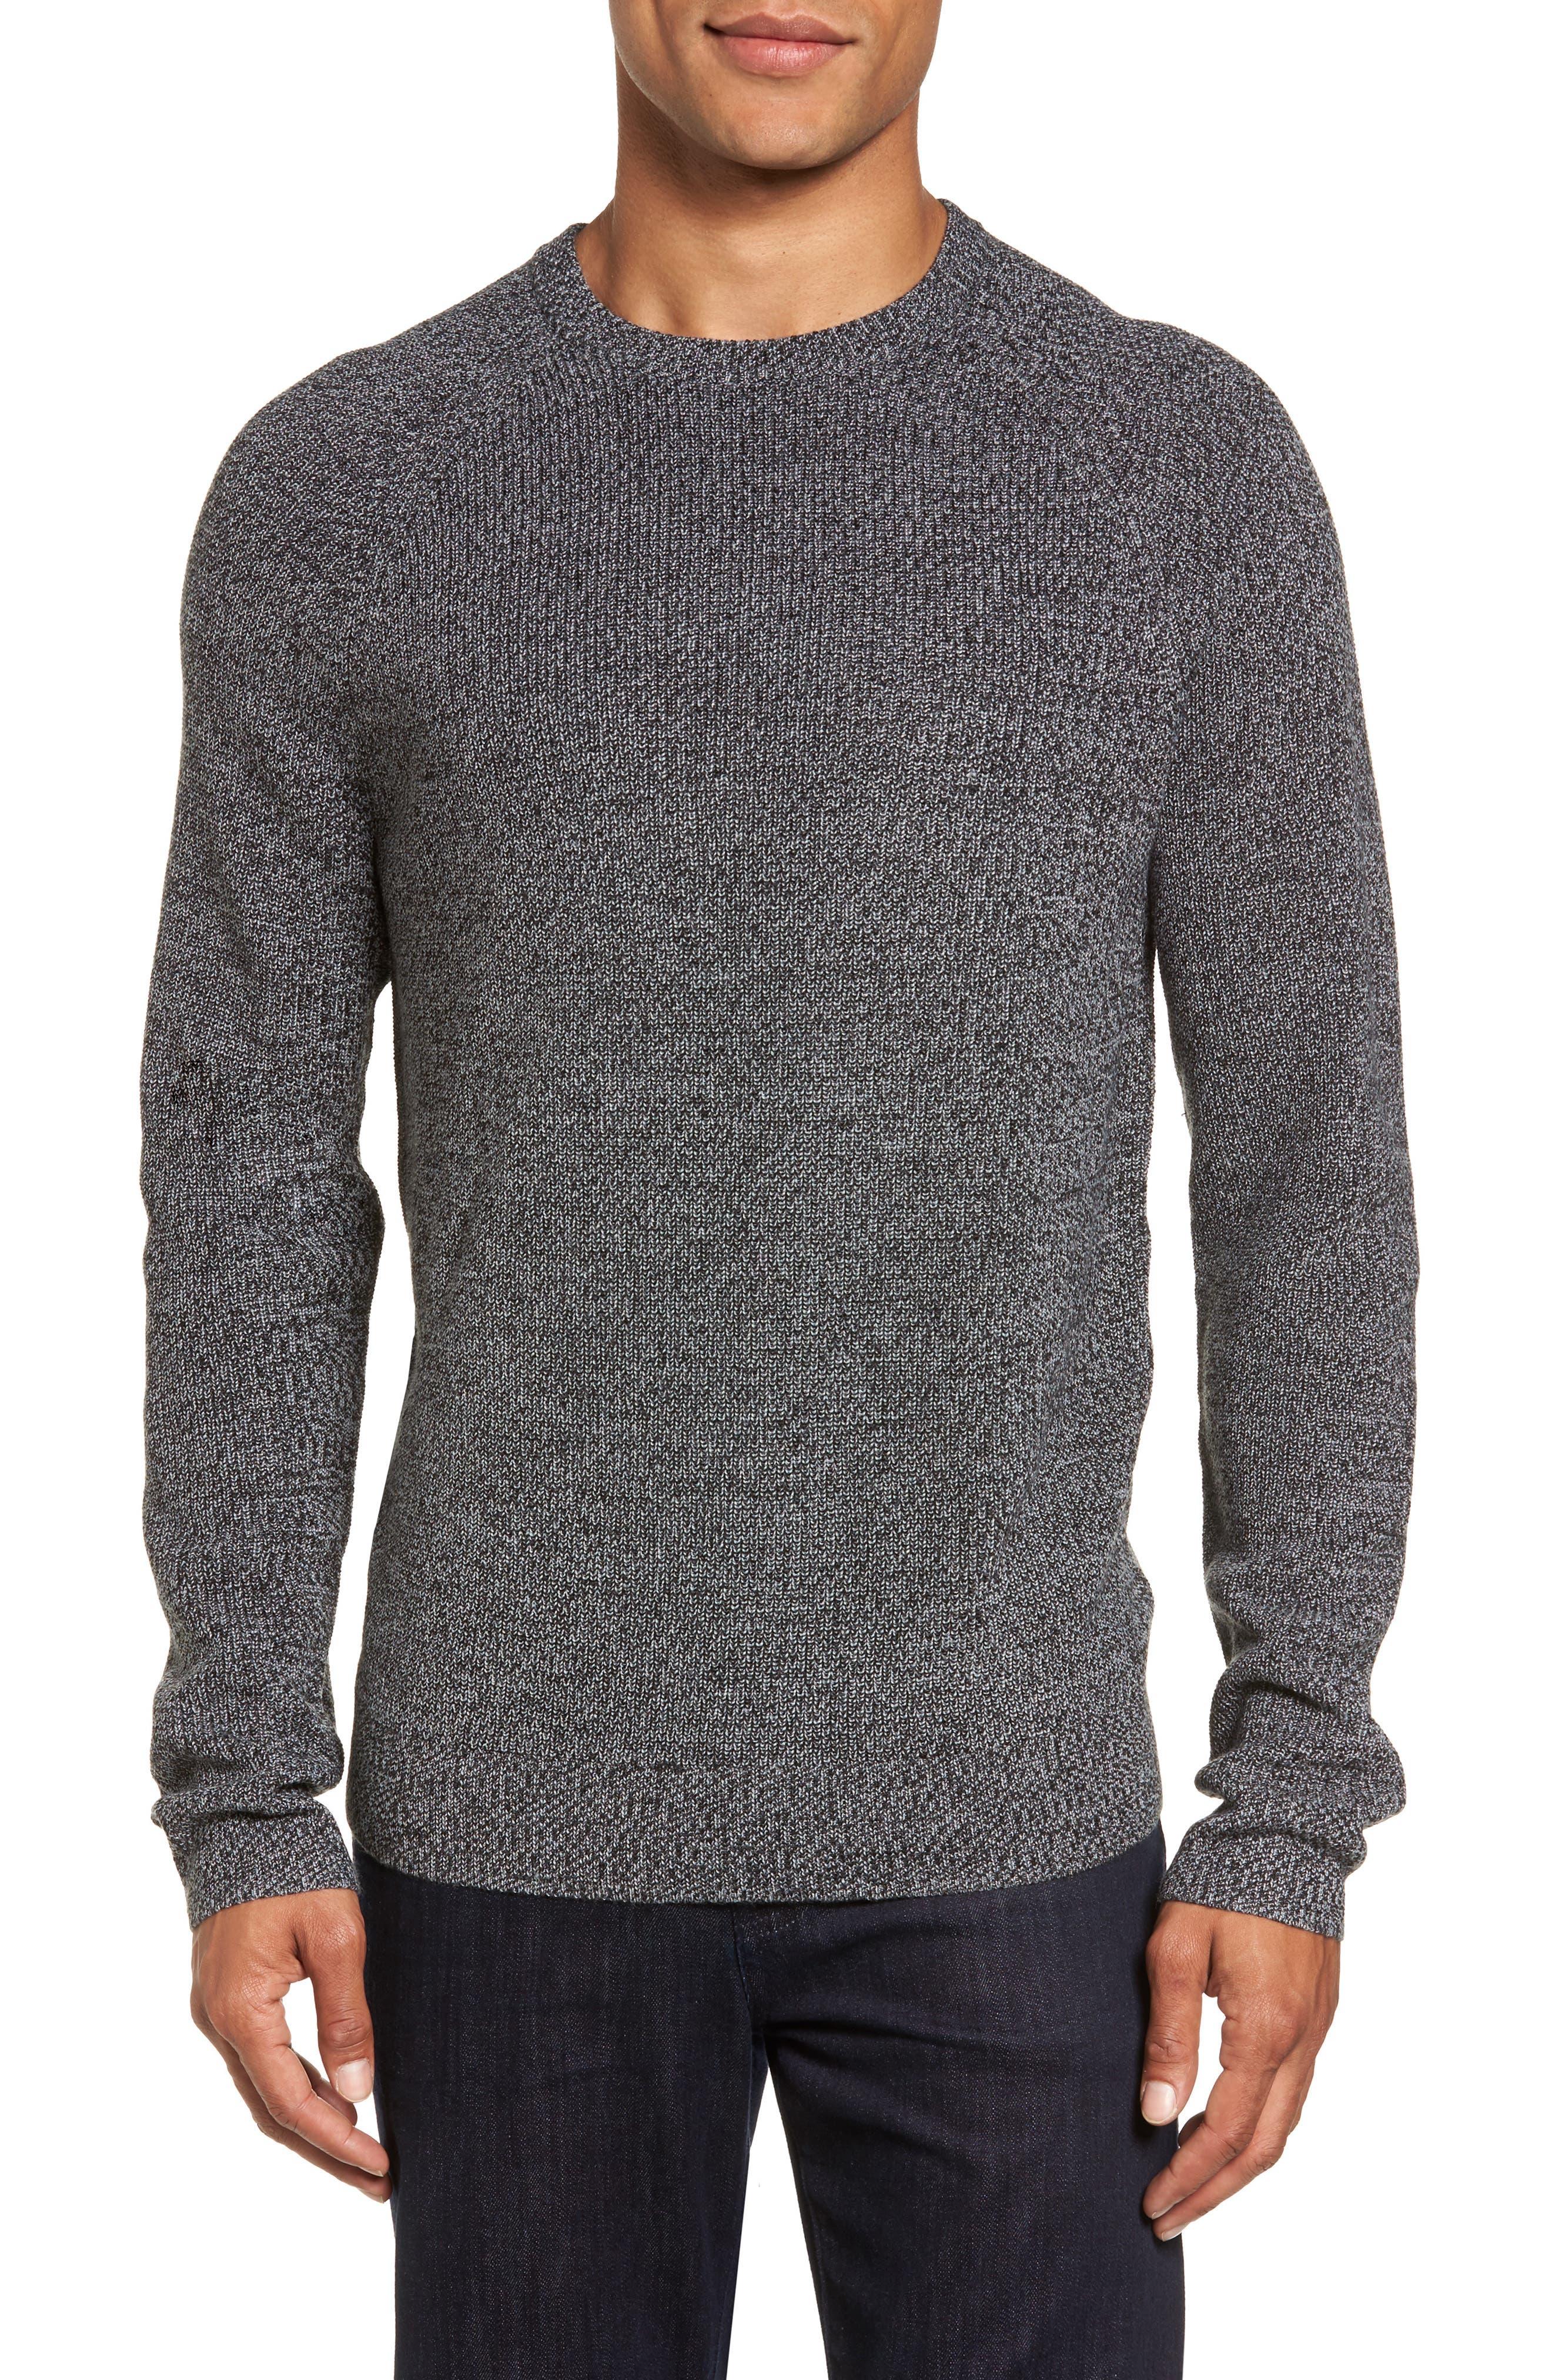 Main Image - Nordstrom Men's Shop Textured Merino Wool Blend Sweater